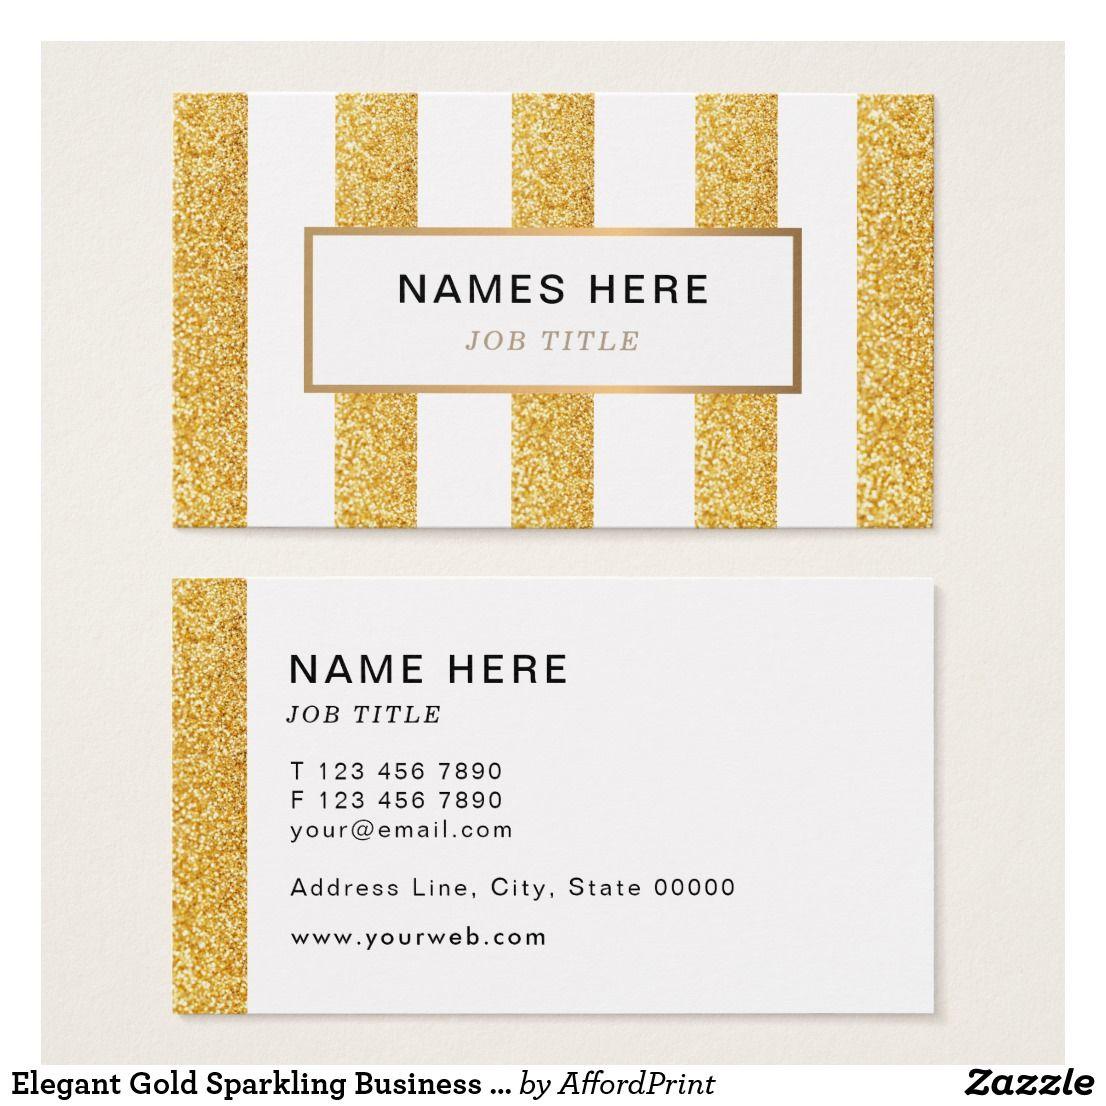 Elegant Gold Sparkling Business Card Elegant Chic Sophisticated Design Featuring Image O Printing Business Cards Business Card Design Elegant Business Cards